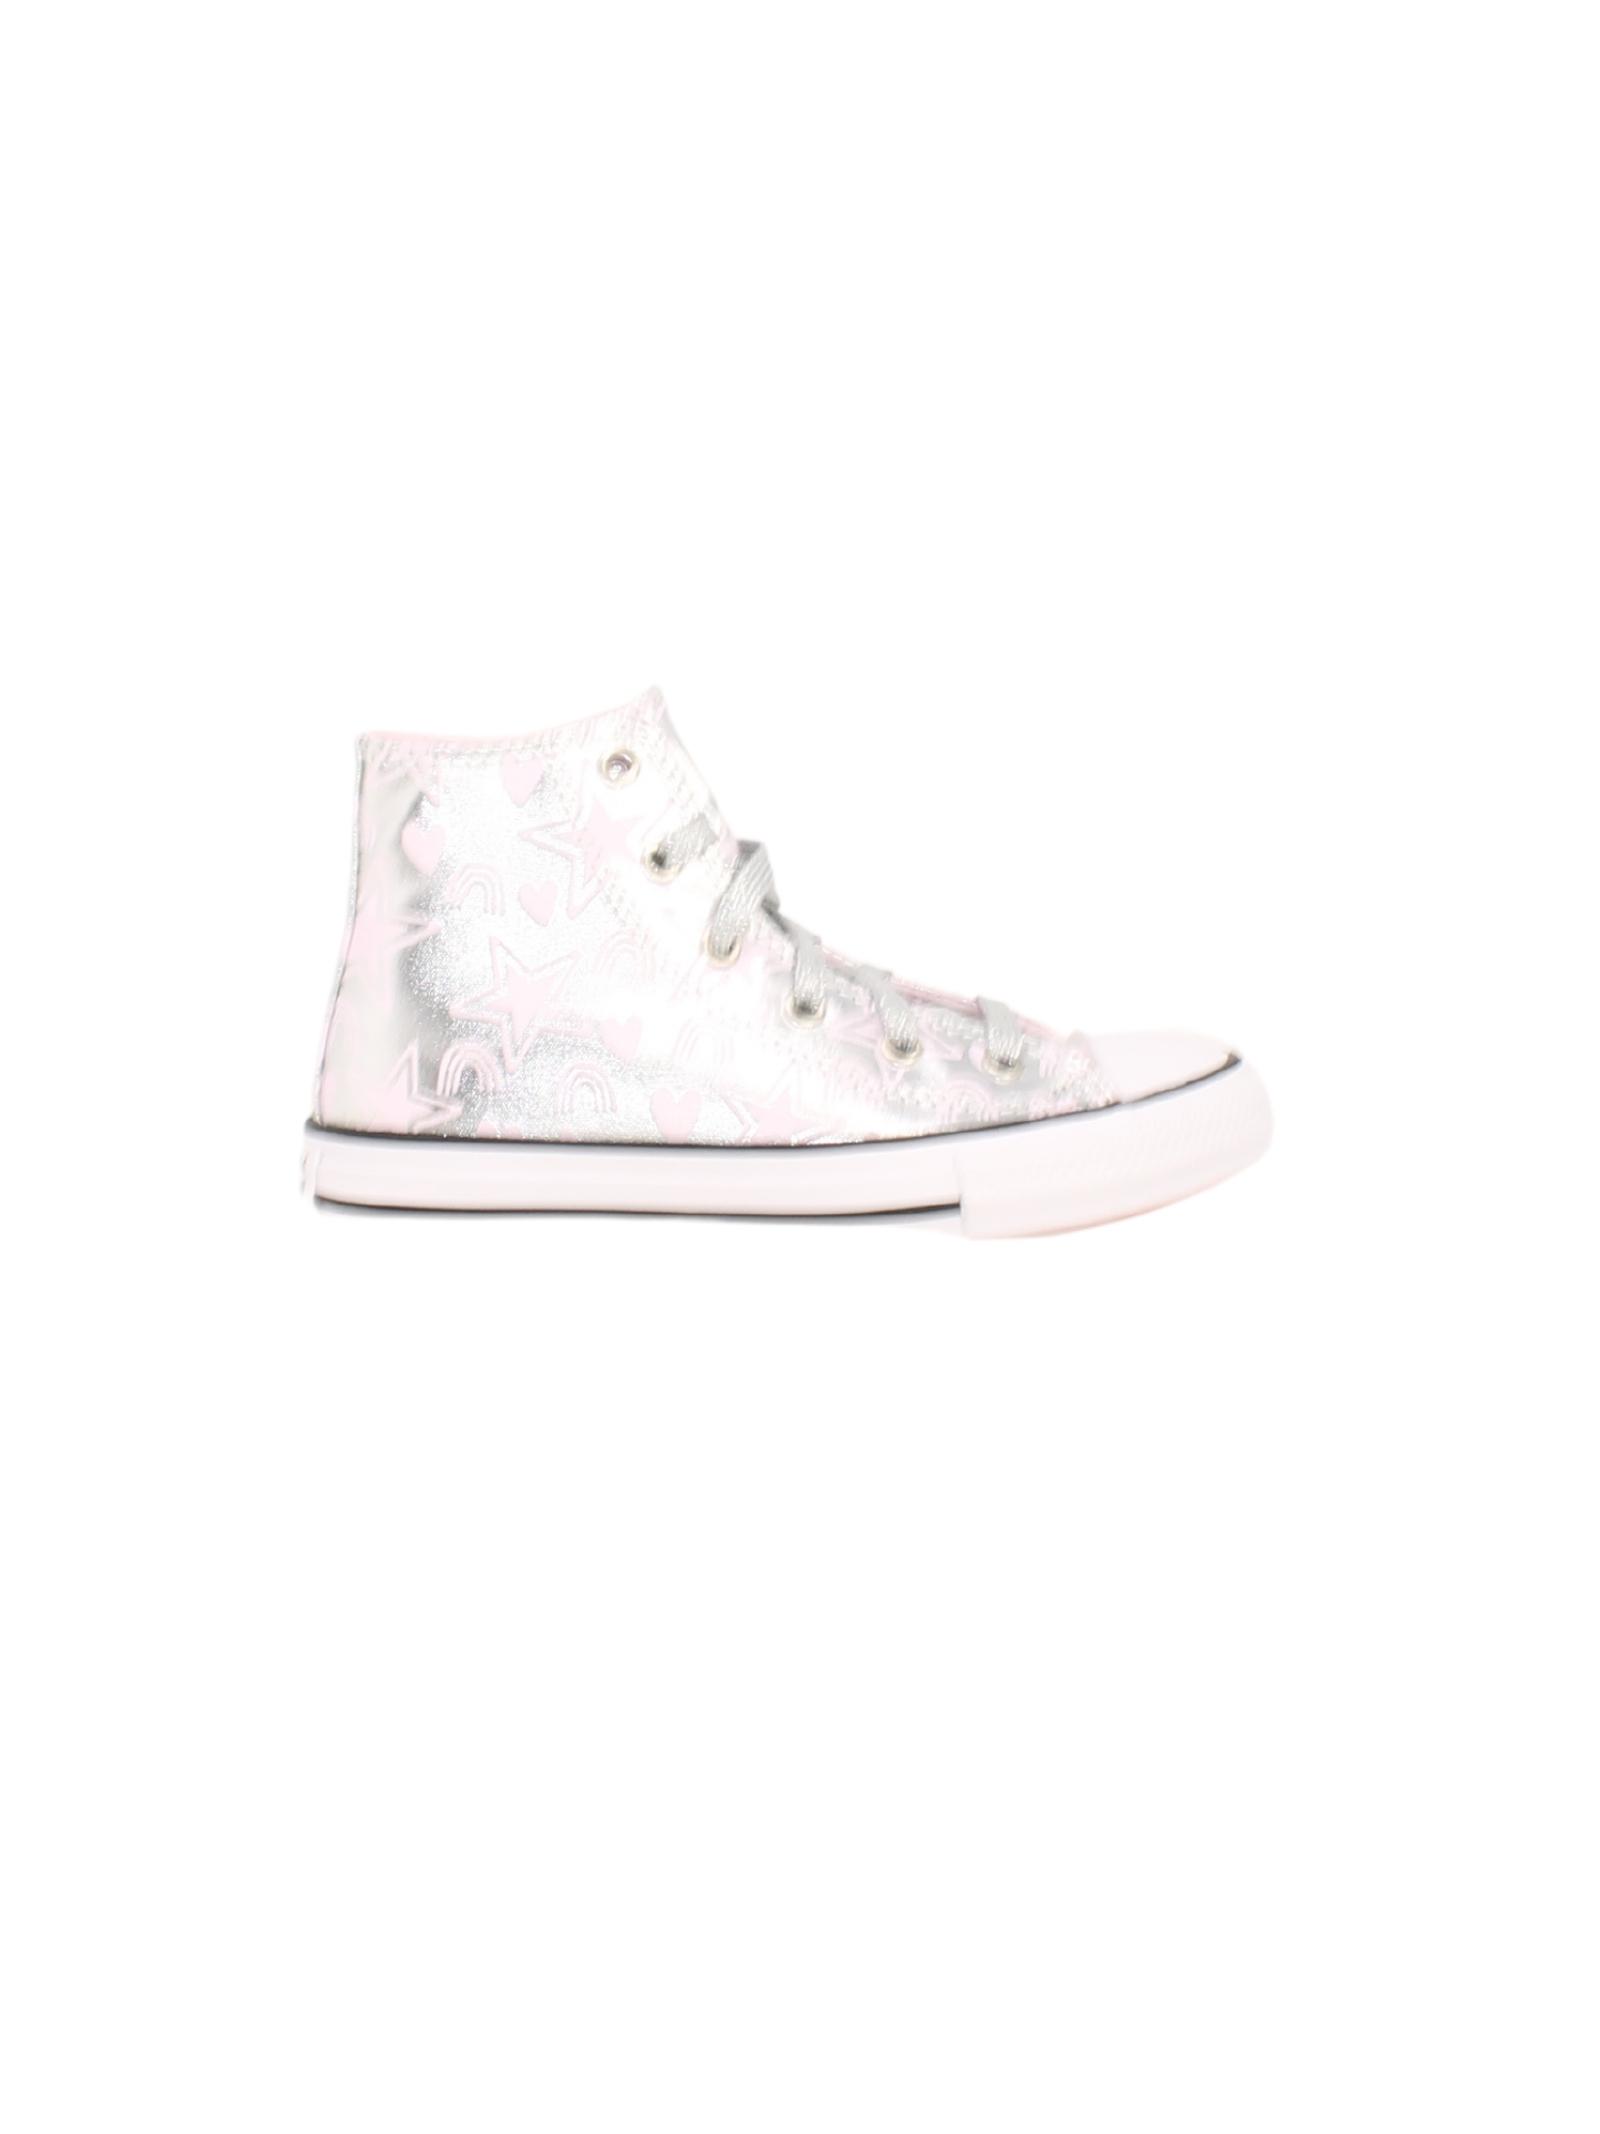 Sneakers Silver Pink Stars Girls CONVERSE KIDS | Sneakers | 672475CSILVER PINK